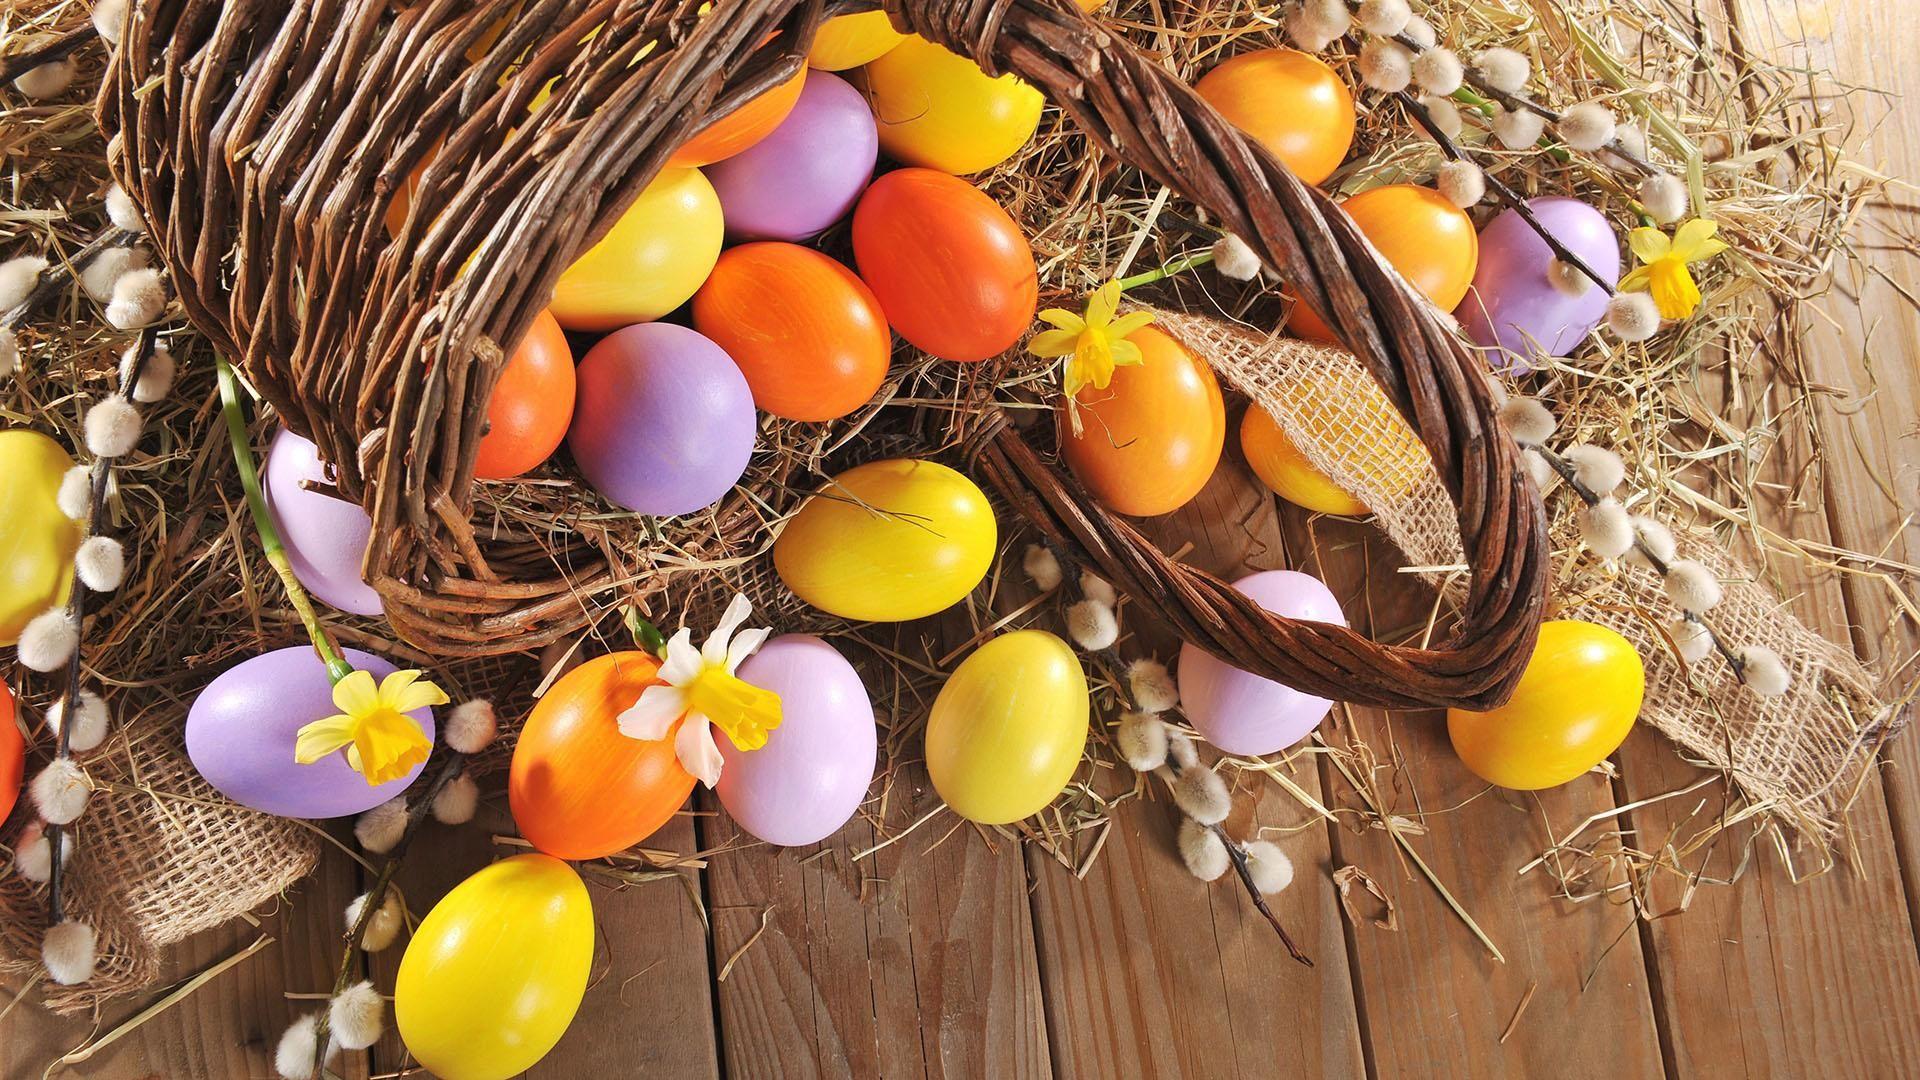 Colorful Easter Eggs [19201080] Hdwallpaper wallpaper